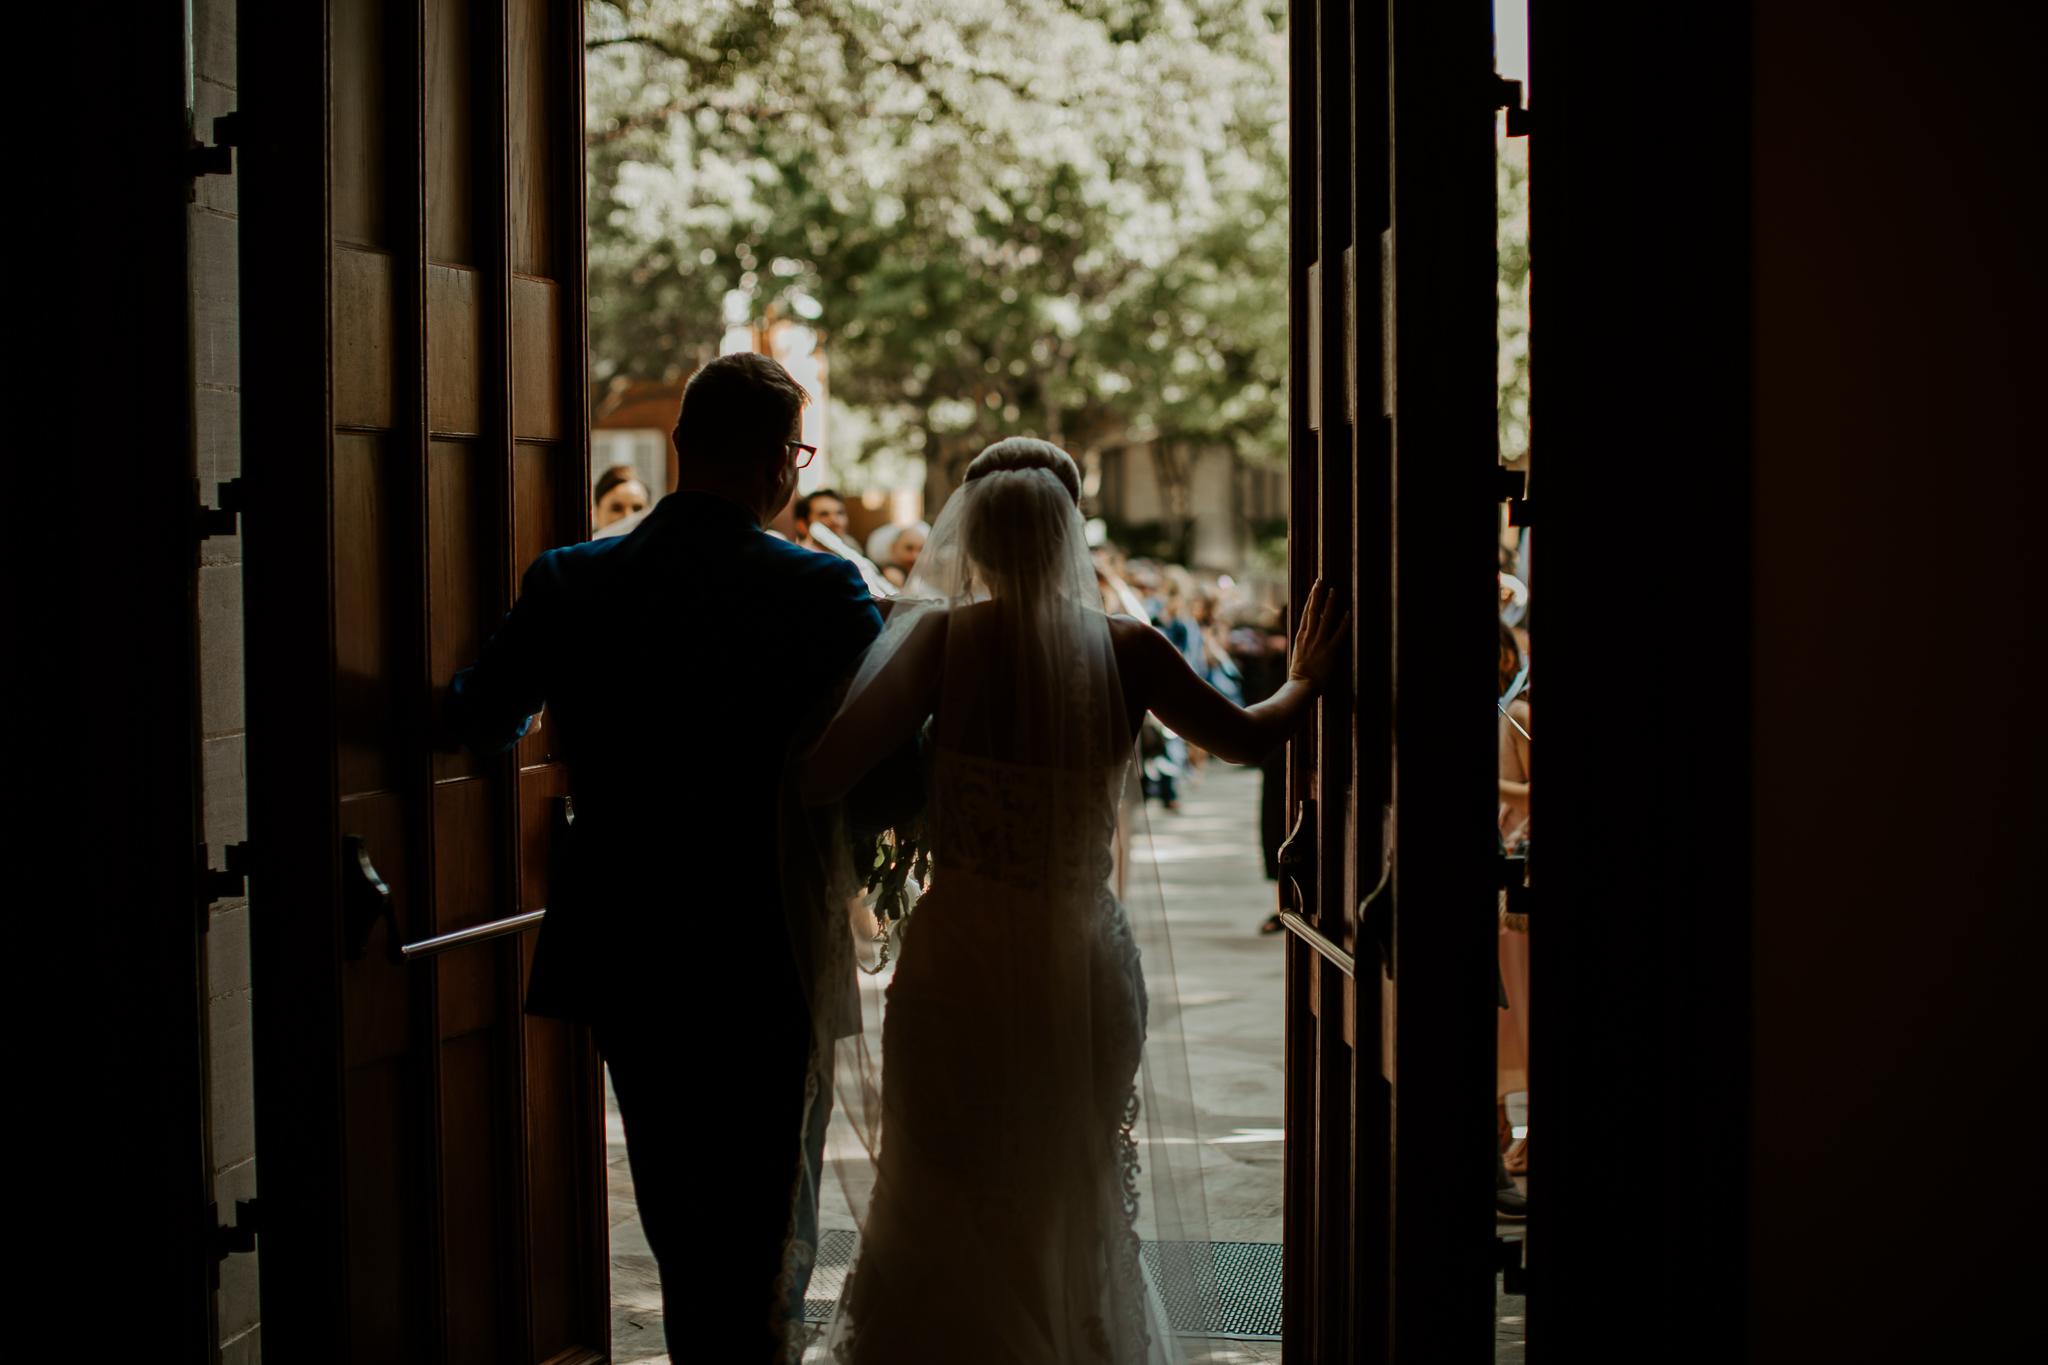 Laken-Mackenzie-Photography-Fort-Worth-Wedding-Photographer-DFW-Wedding-Photographer (1 of 6)-2.jpg